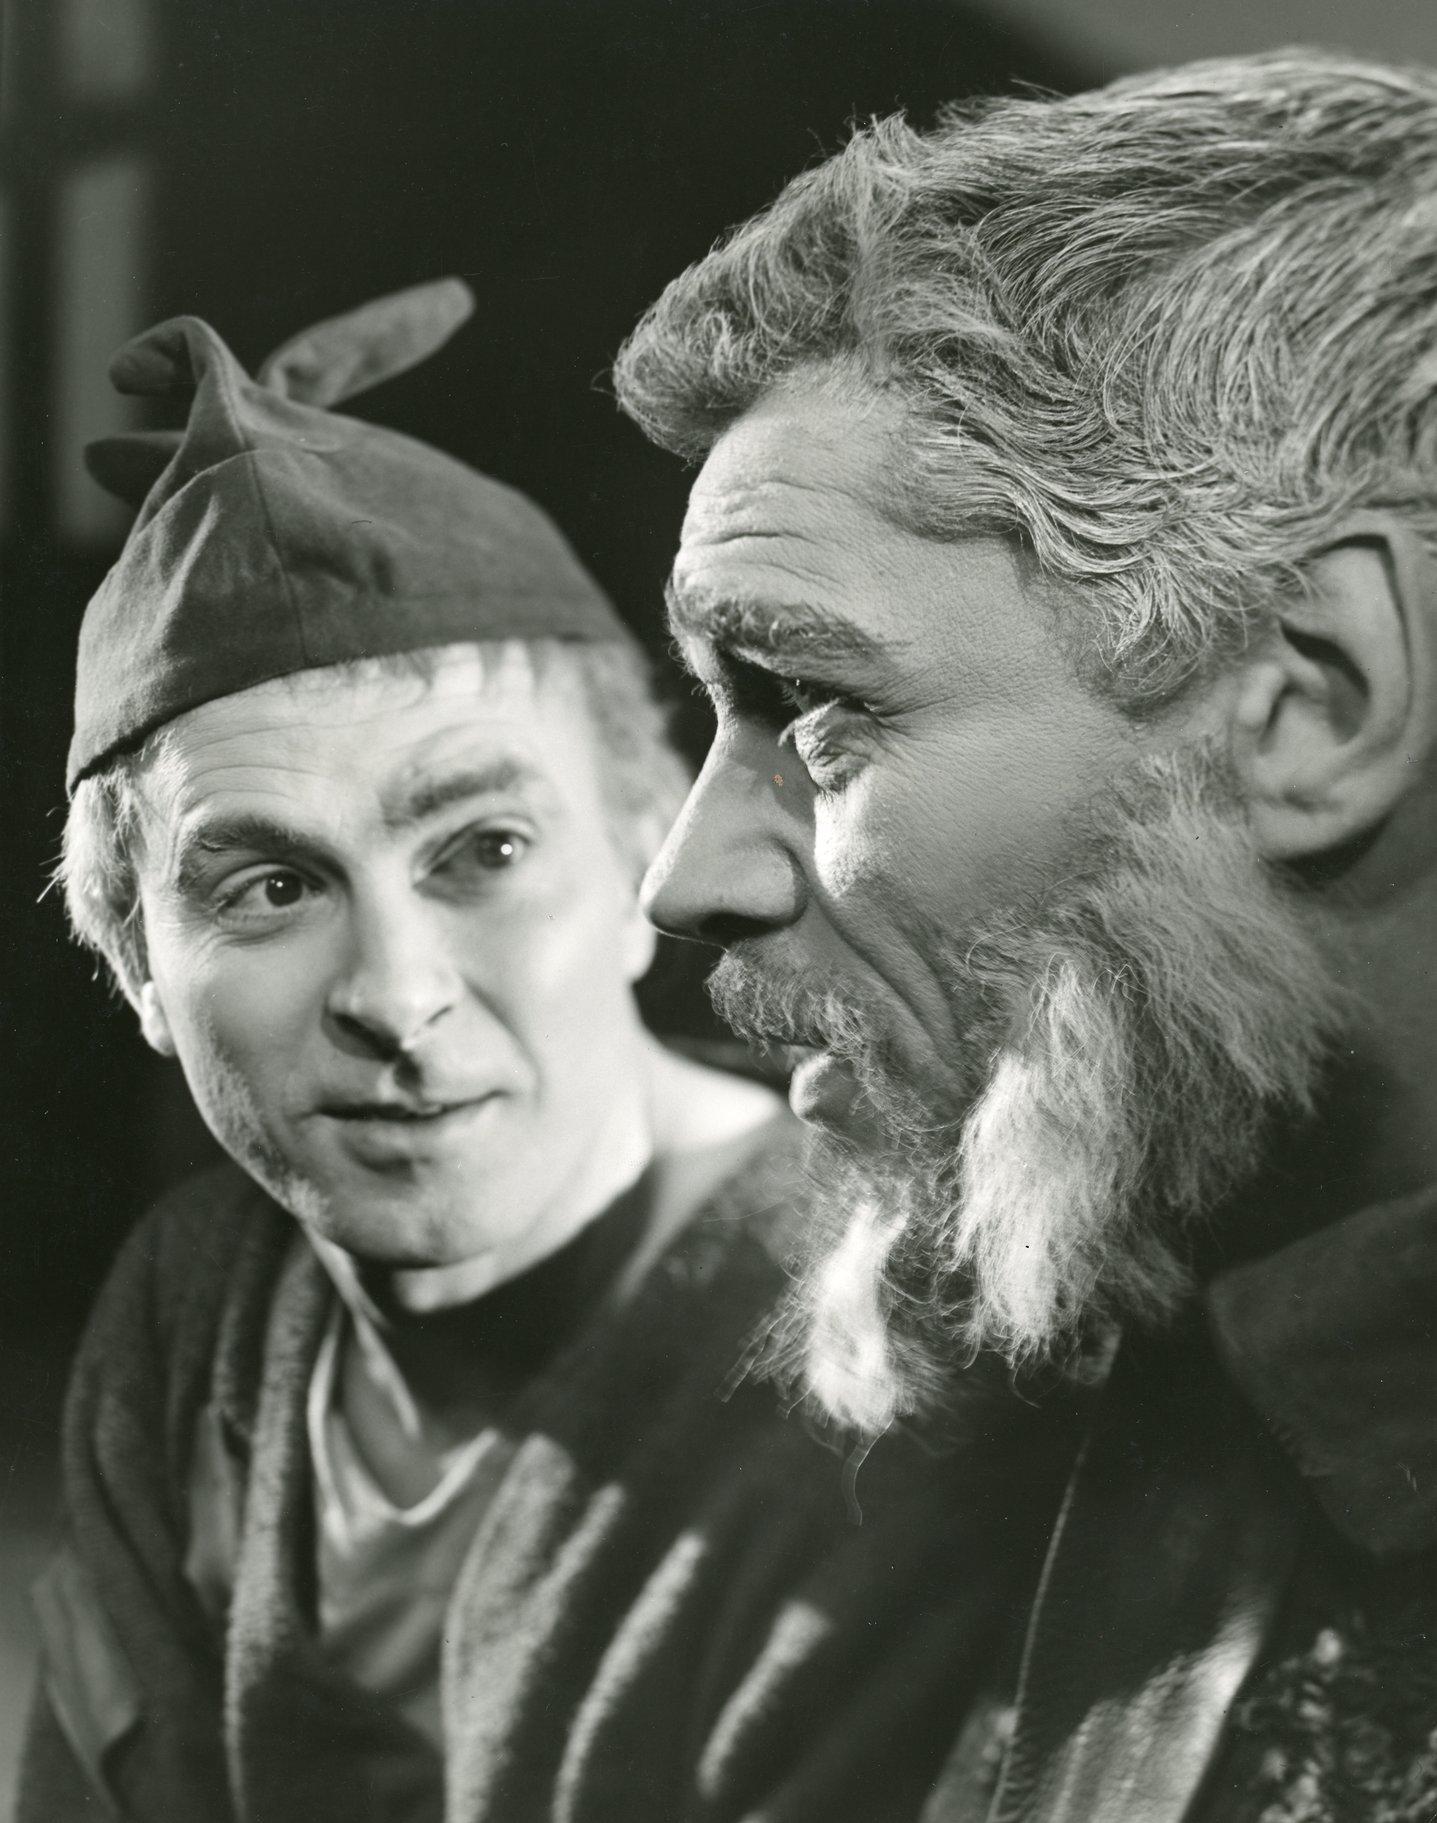 A man in a cloth cap talks to an older bearded man.